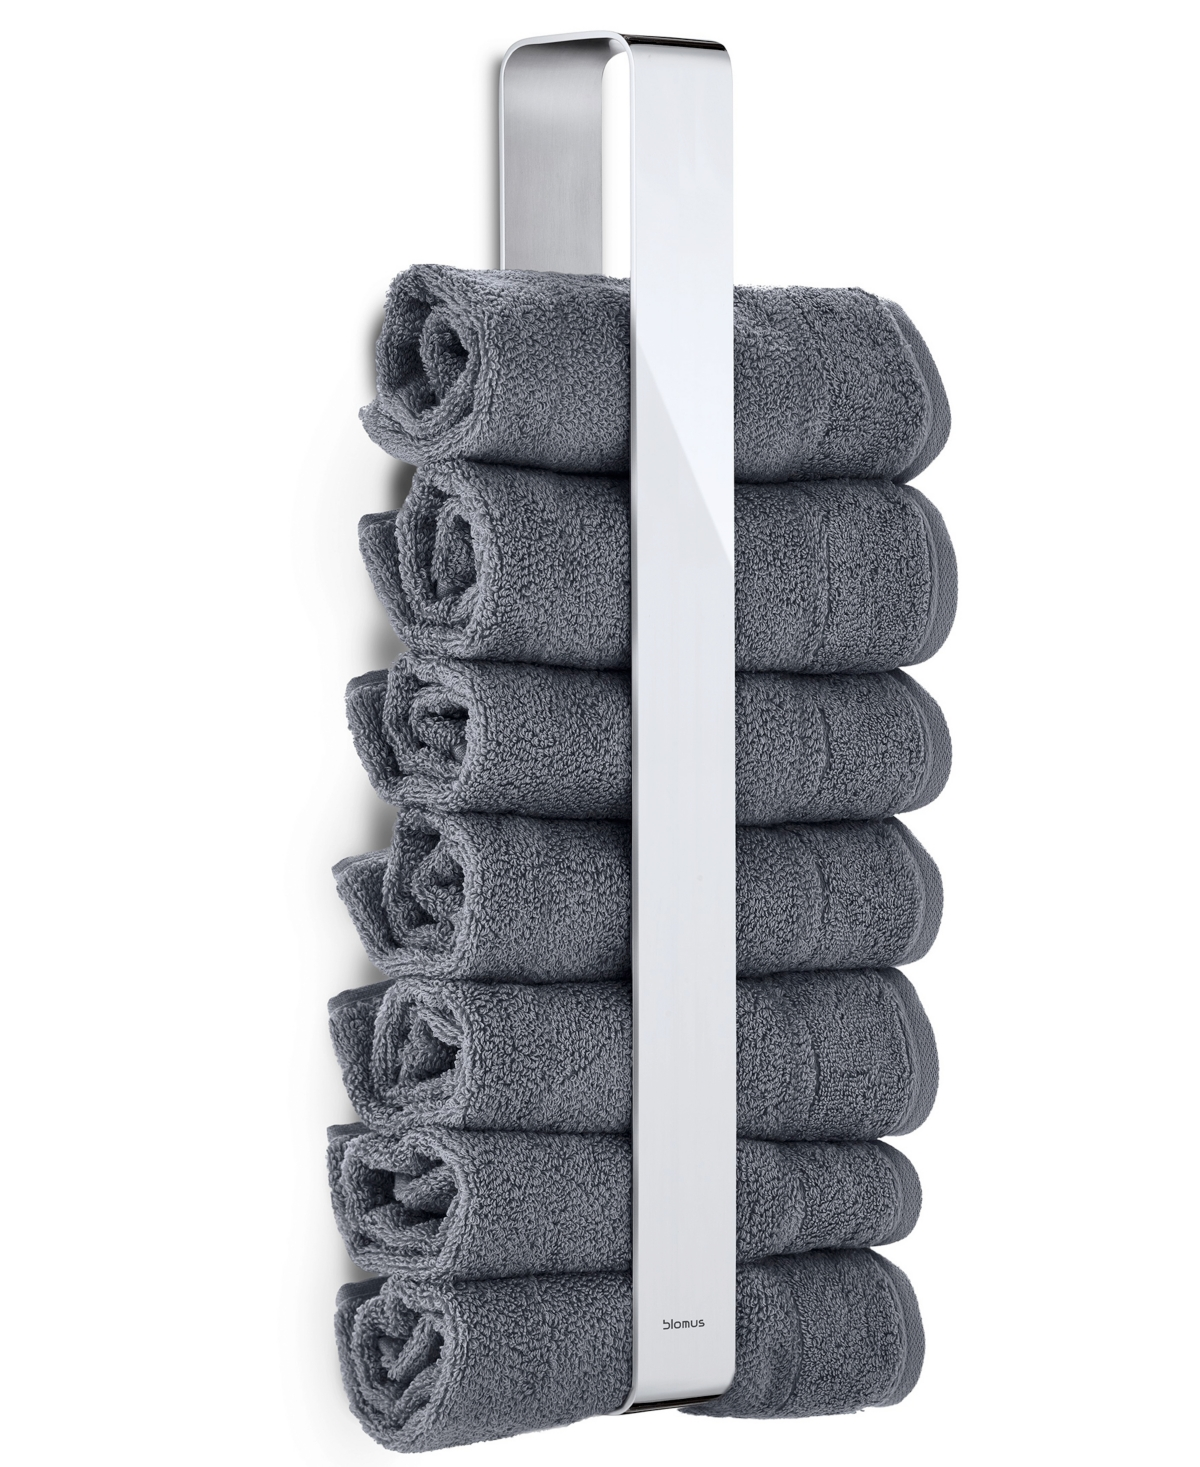 blomus Stainless Steel Towel Holder - Polished Bedding